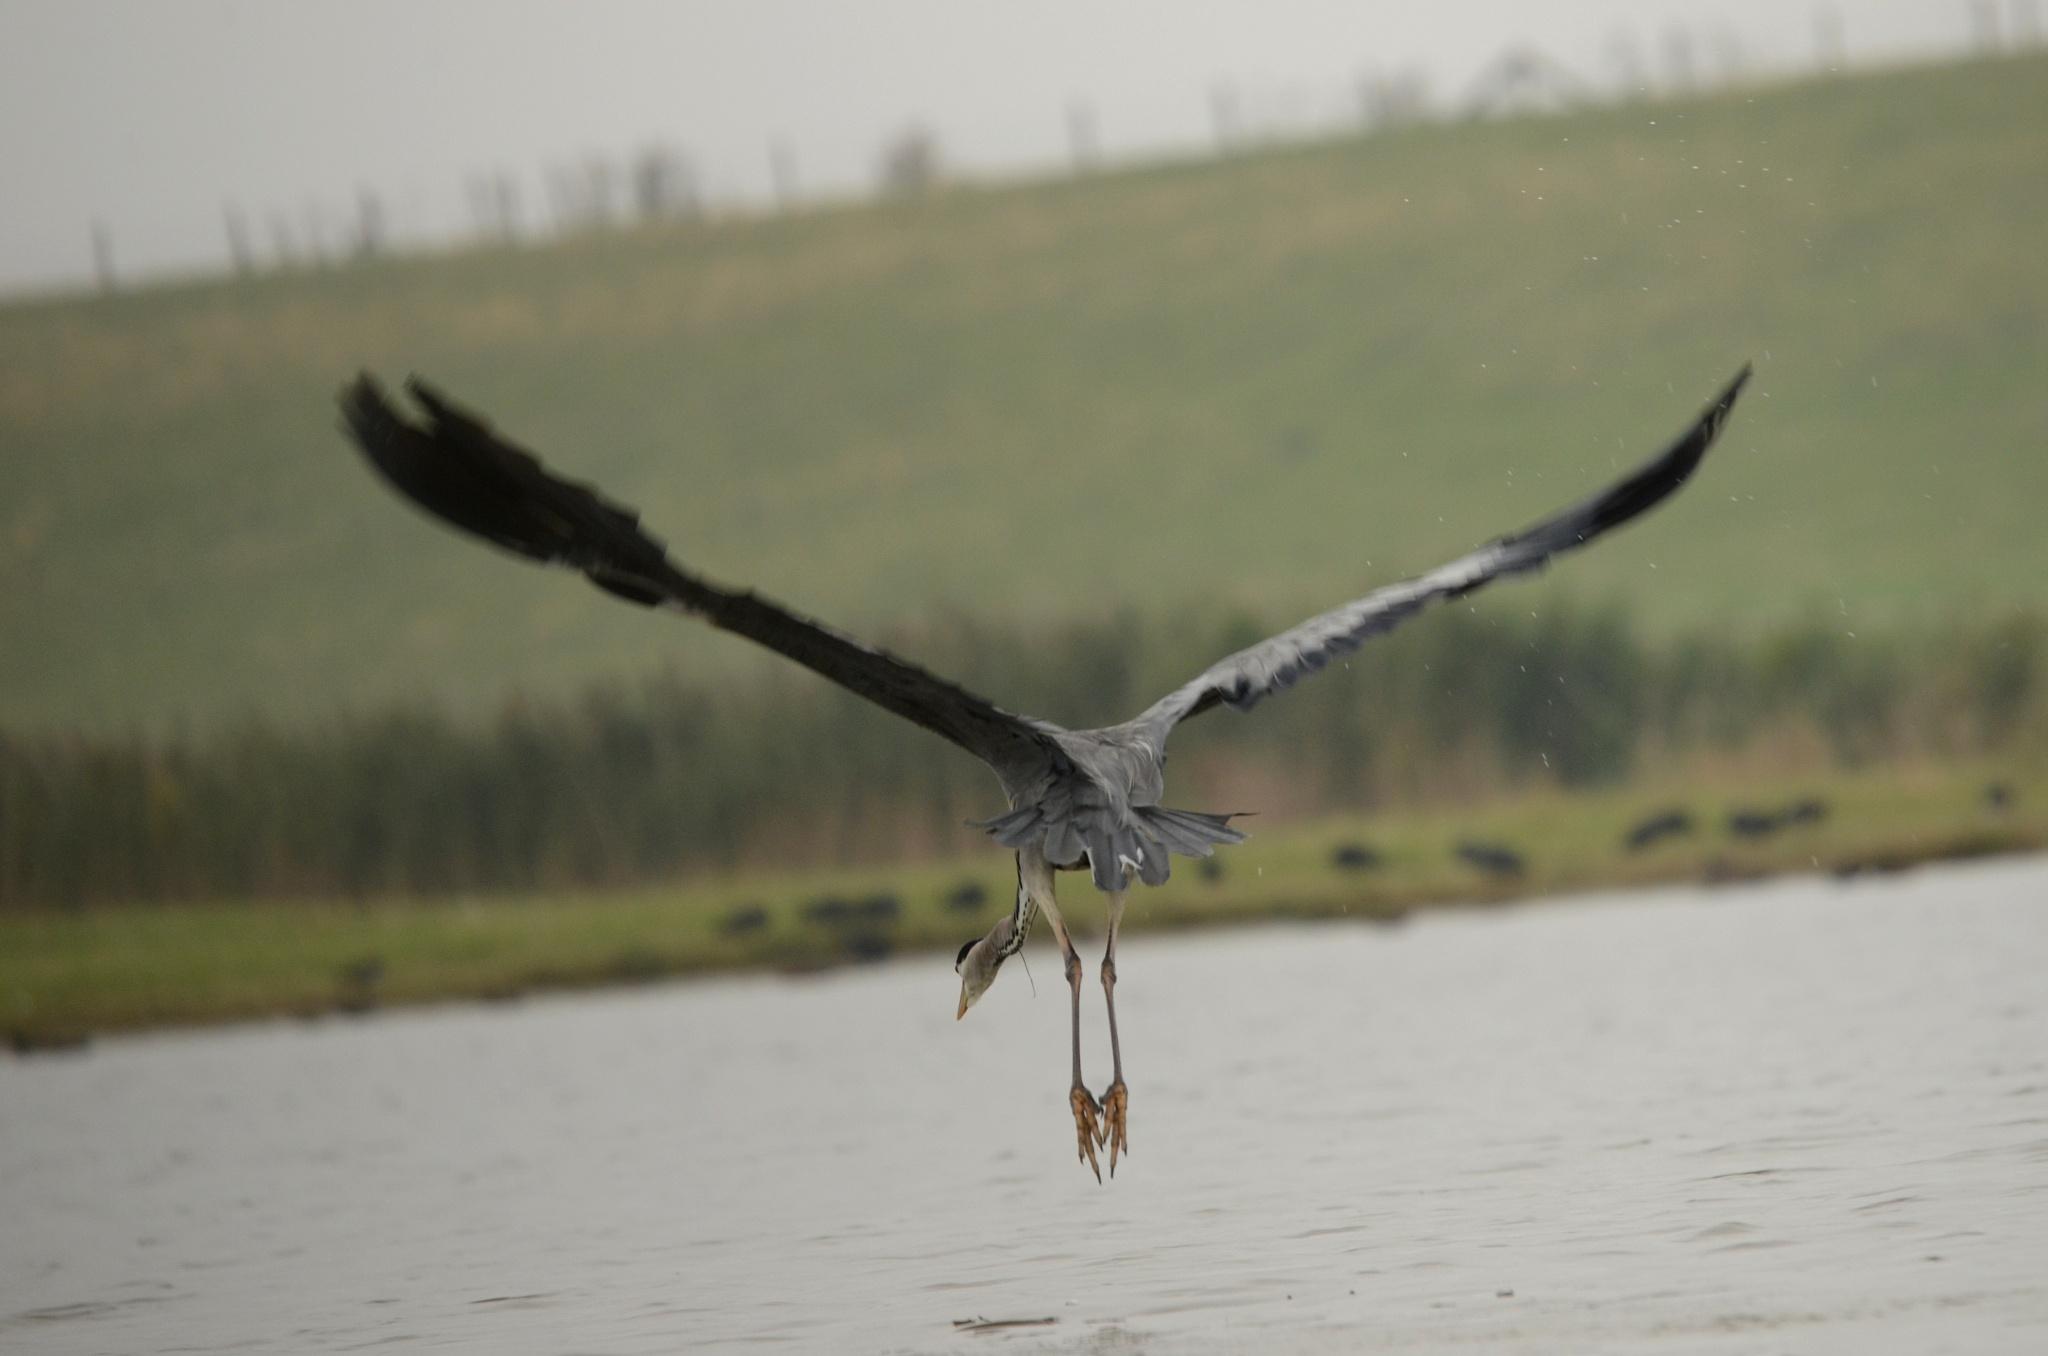 Flying Bleu Haron by klaaspelgrim